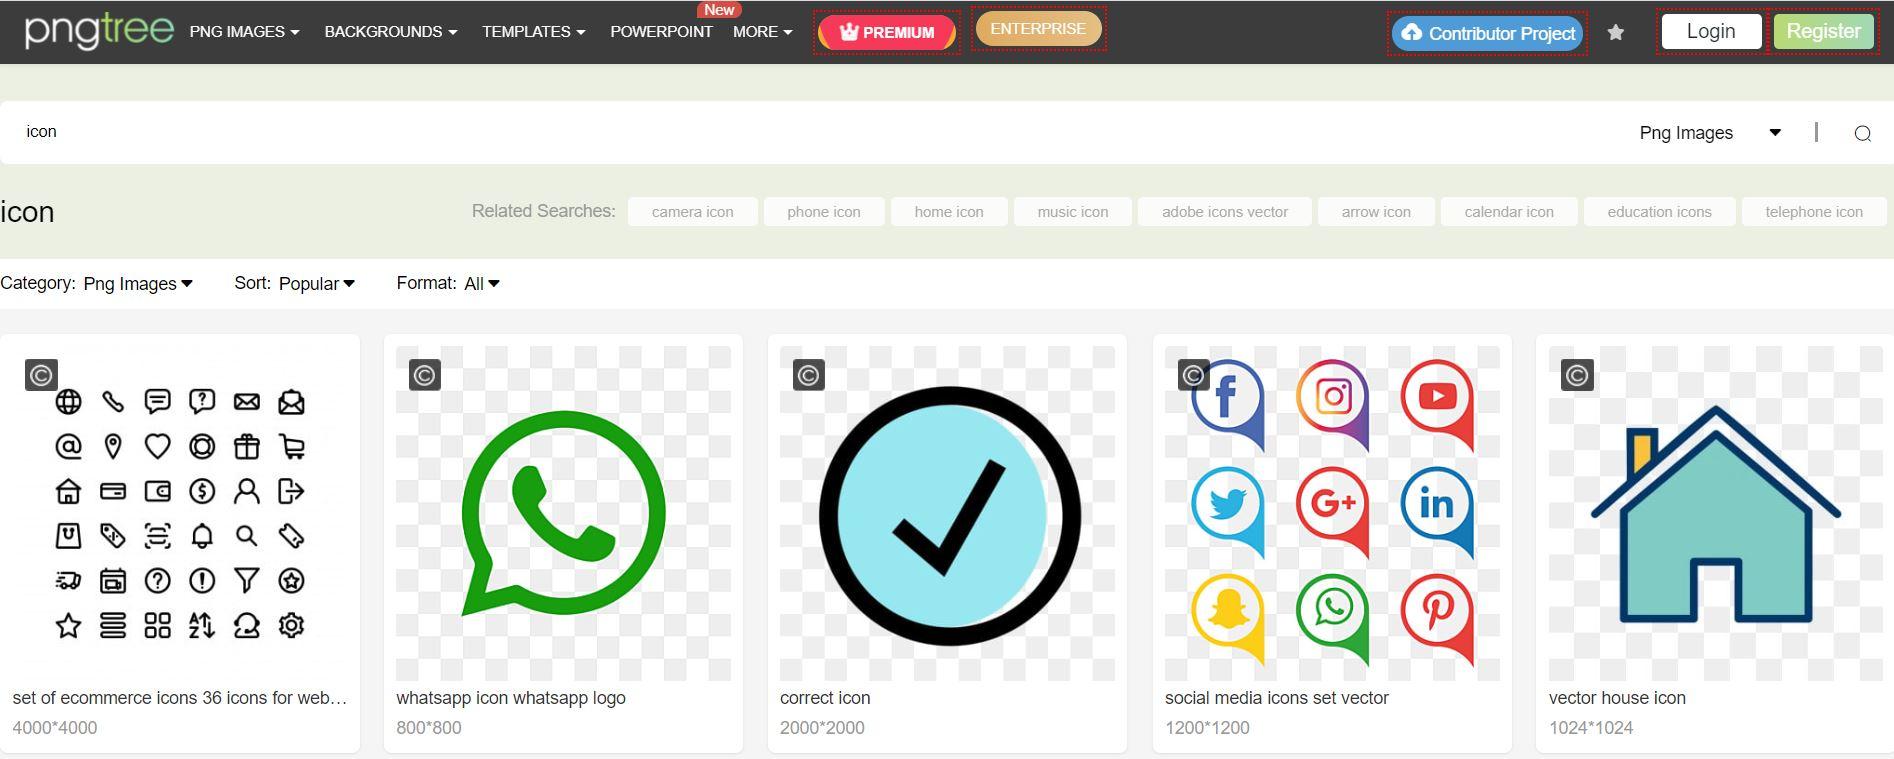 Pngtree has amassed millions of unique graphic design tools